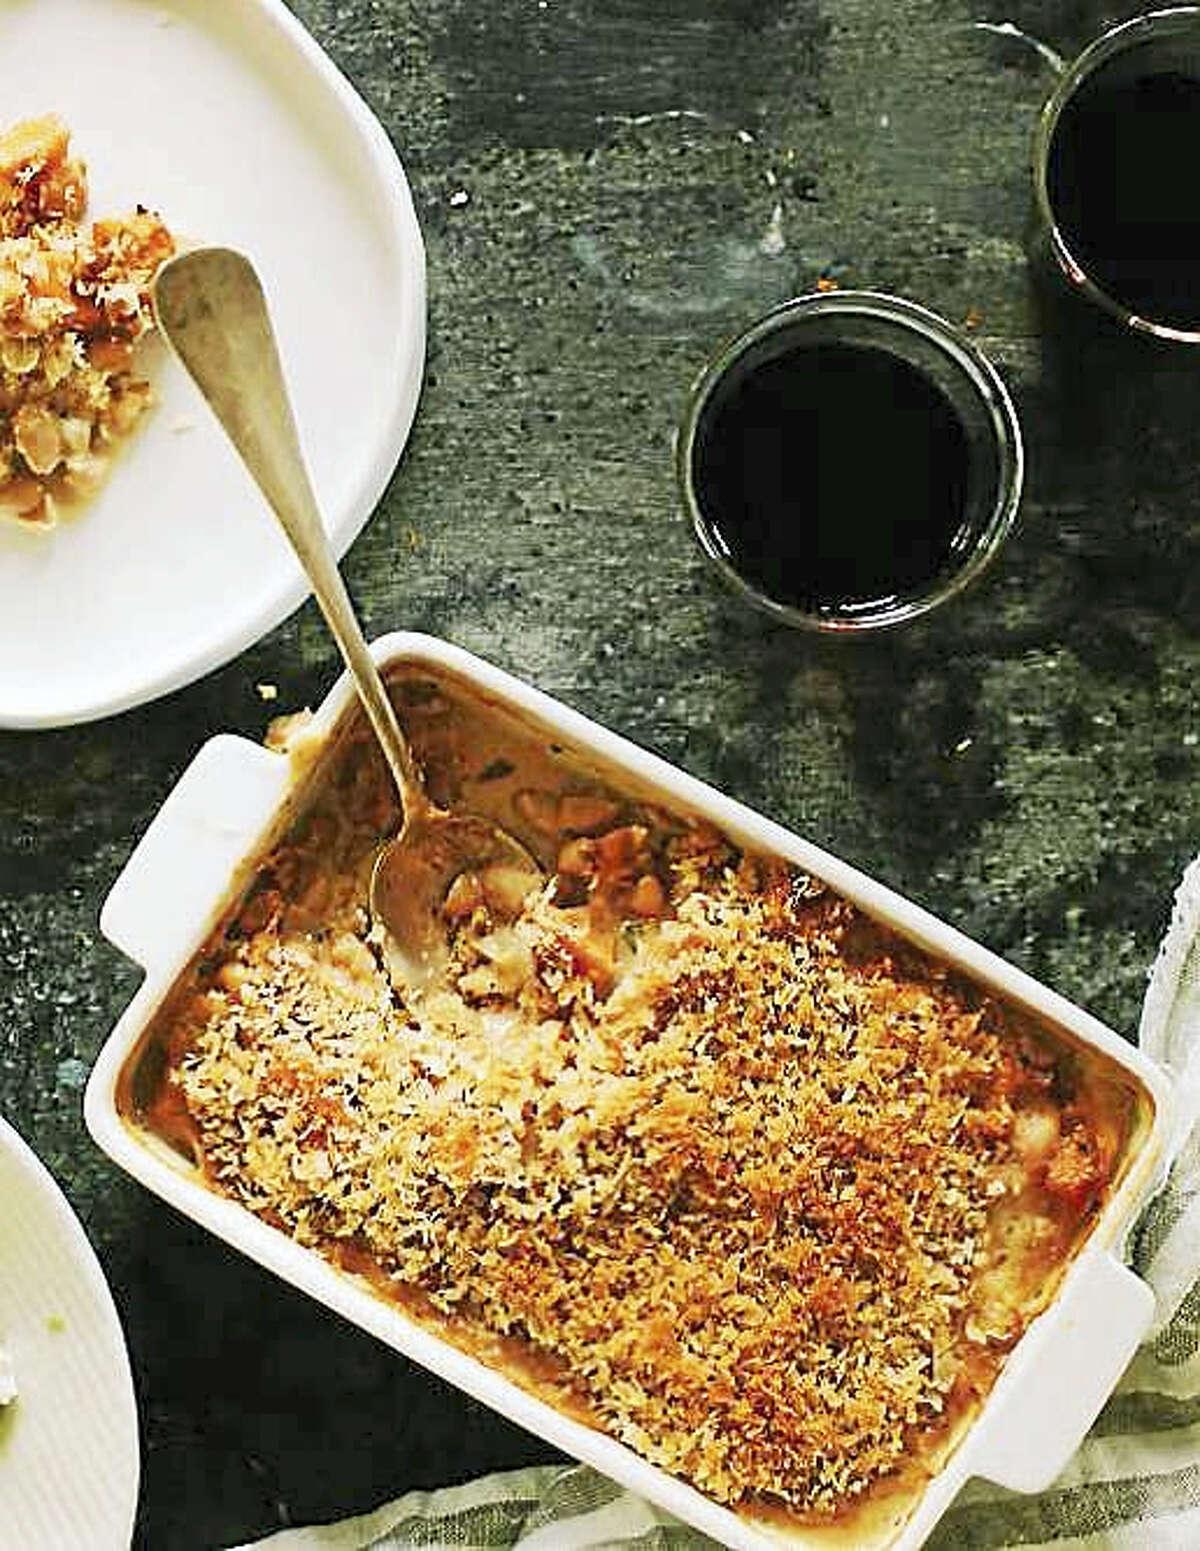 White bean and pumpkin gratin with crispy shallot crumbs